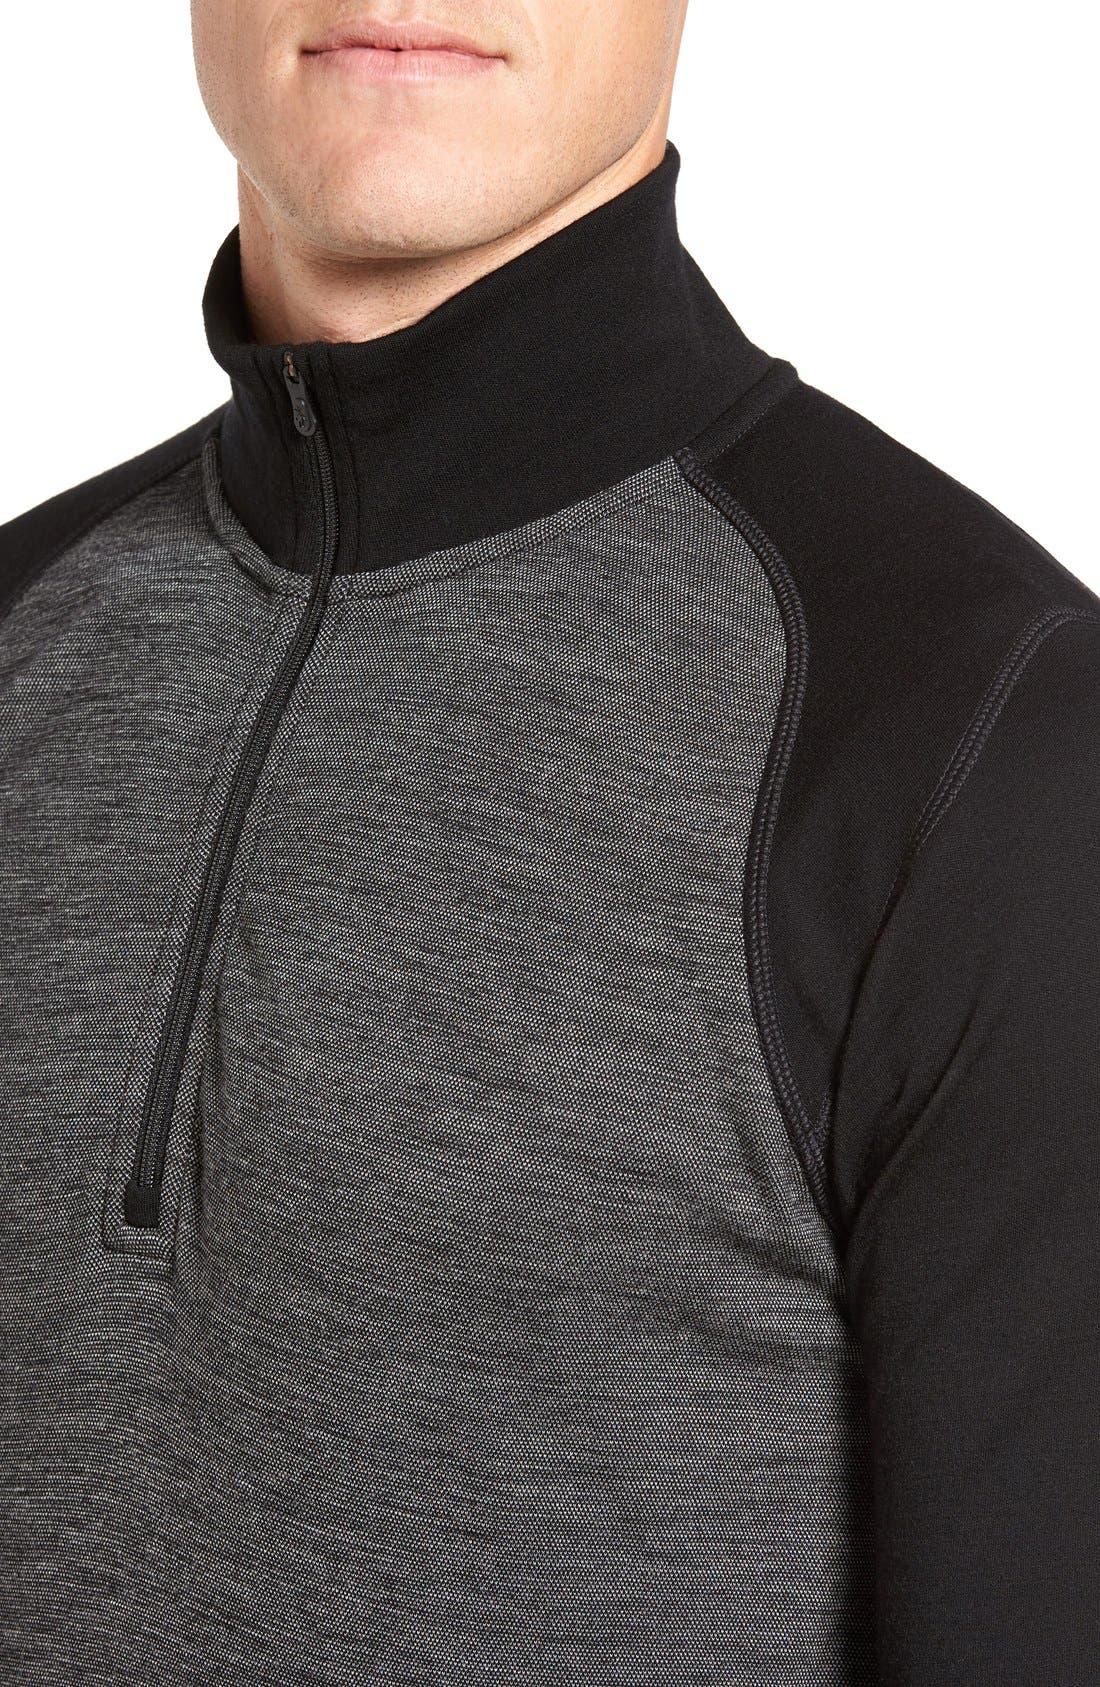 Merino 250 Base Layer Pattern Quarter Zip Pullover,                             Alternate thumbnail 8, color,